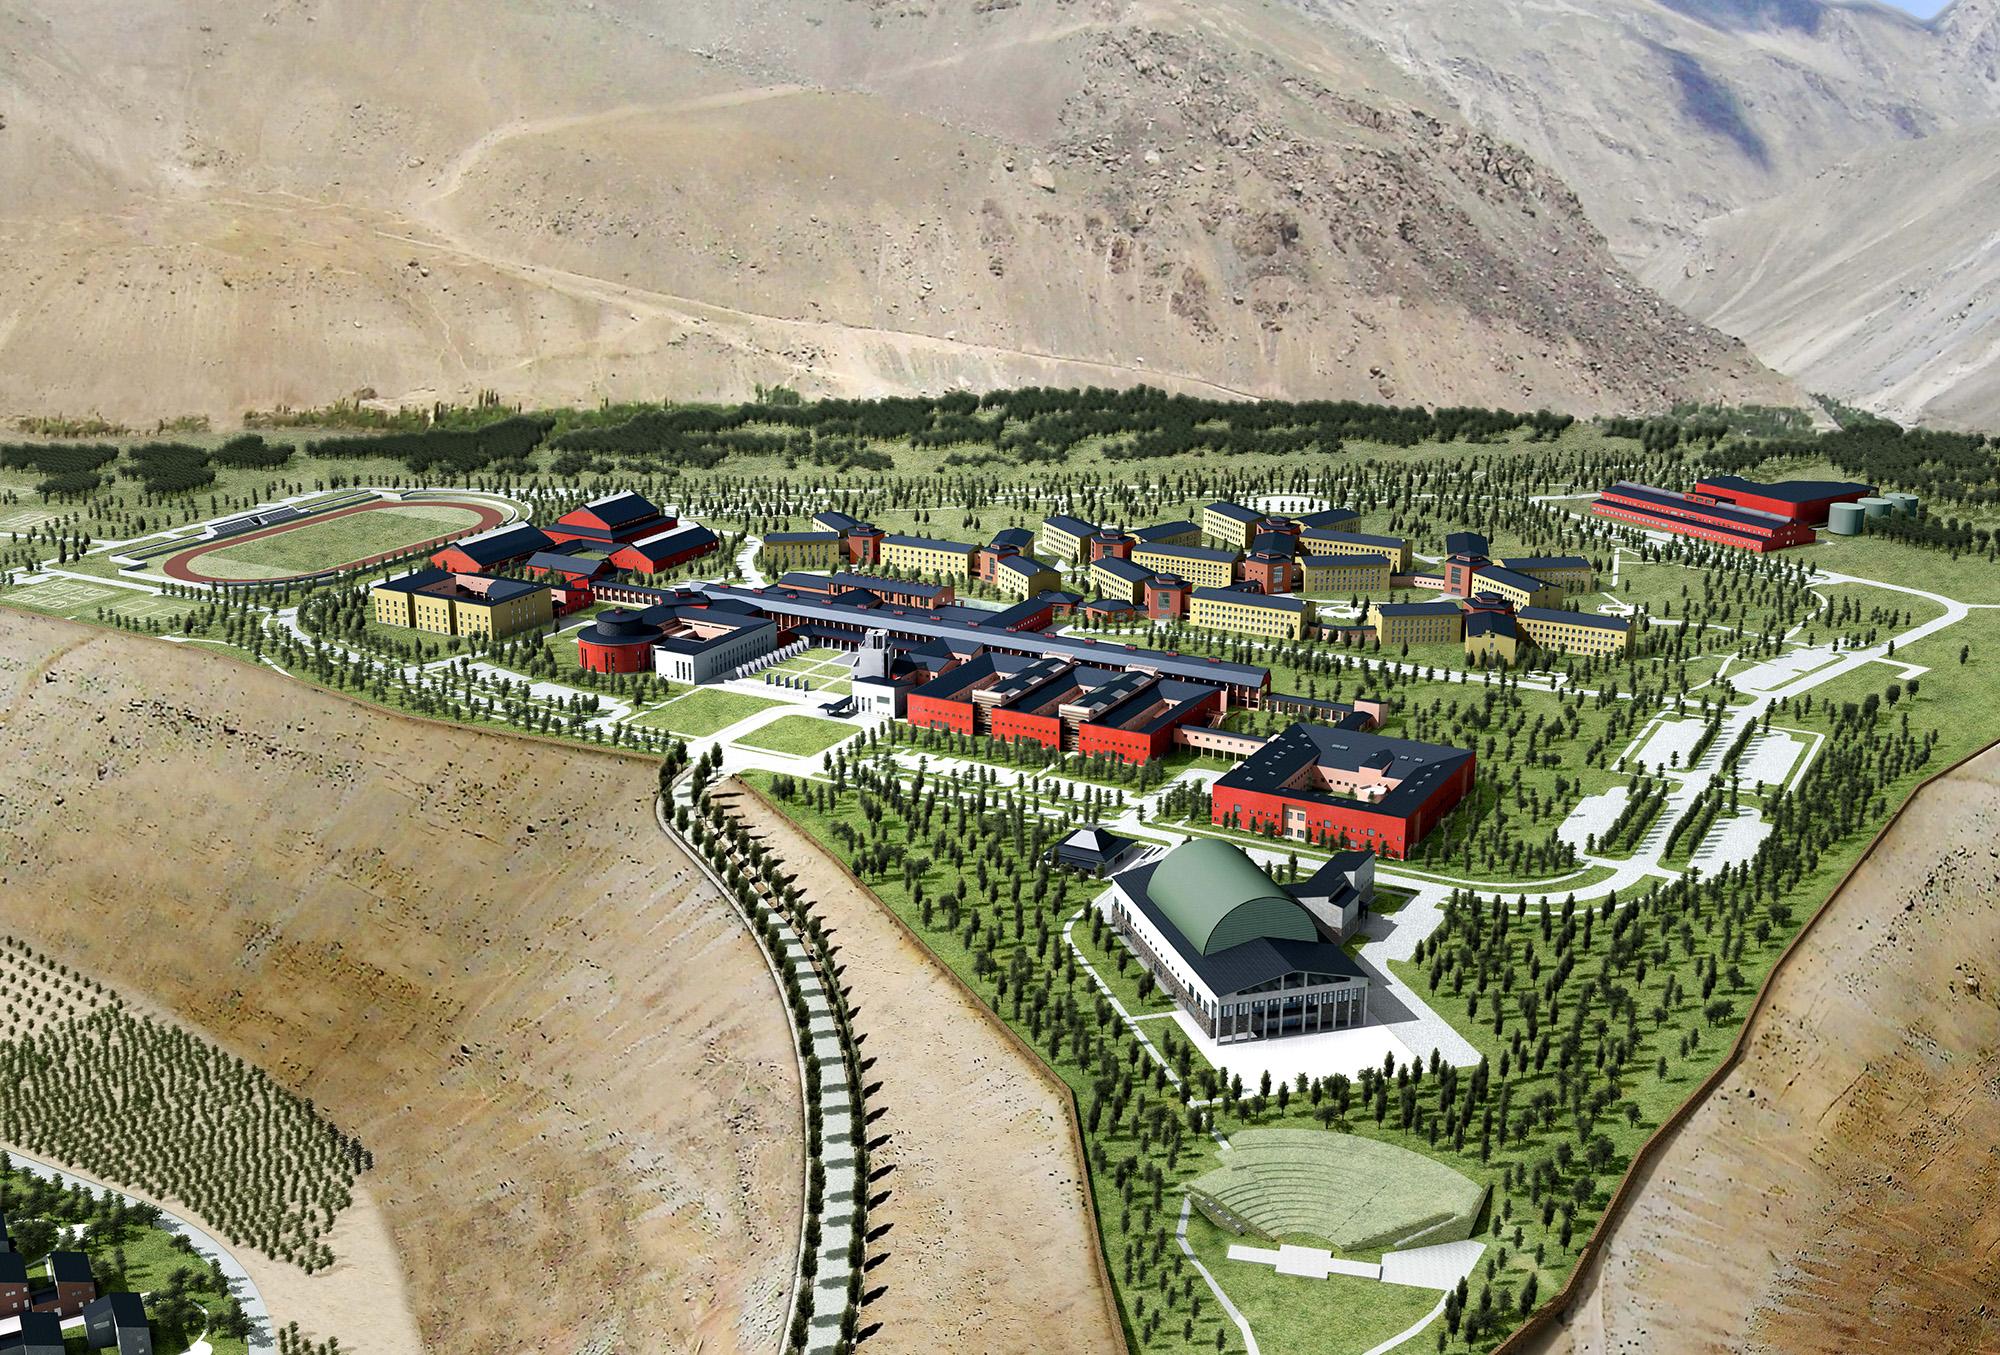 University of Central Asia Master Plan Khorog, reproduced in Barakah